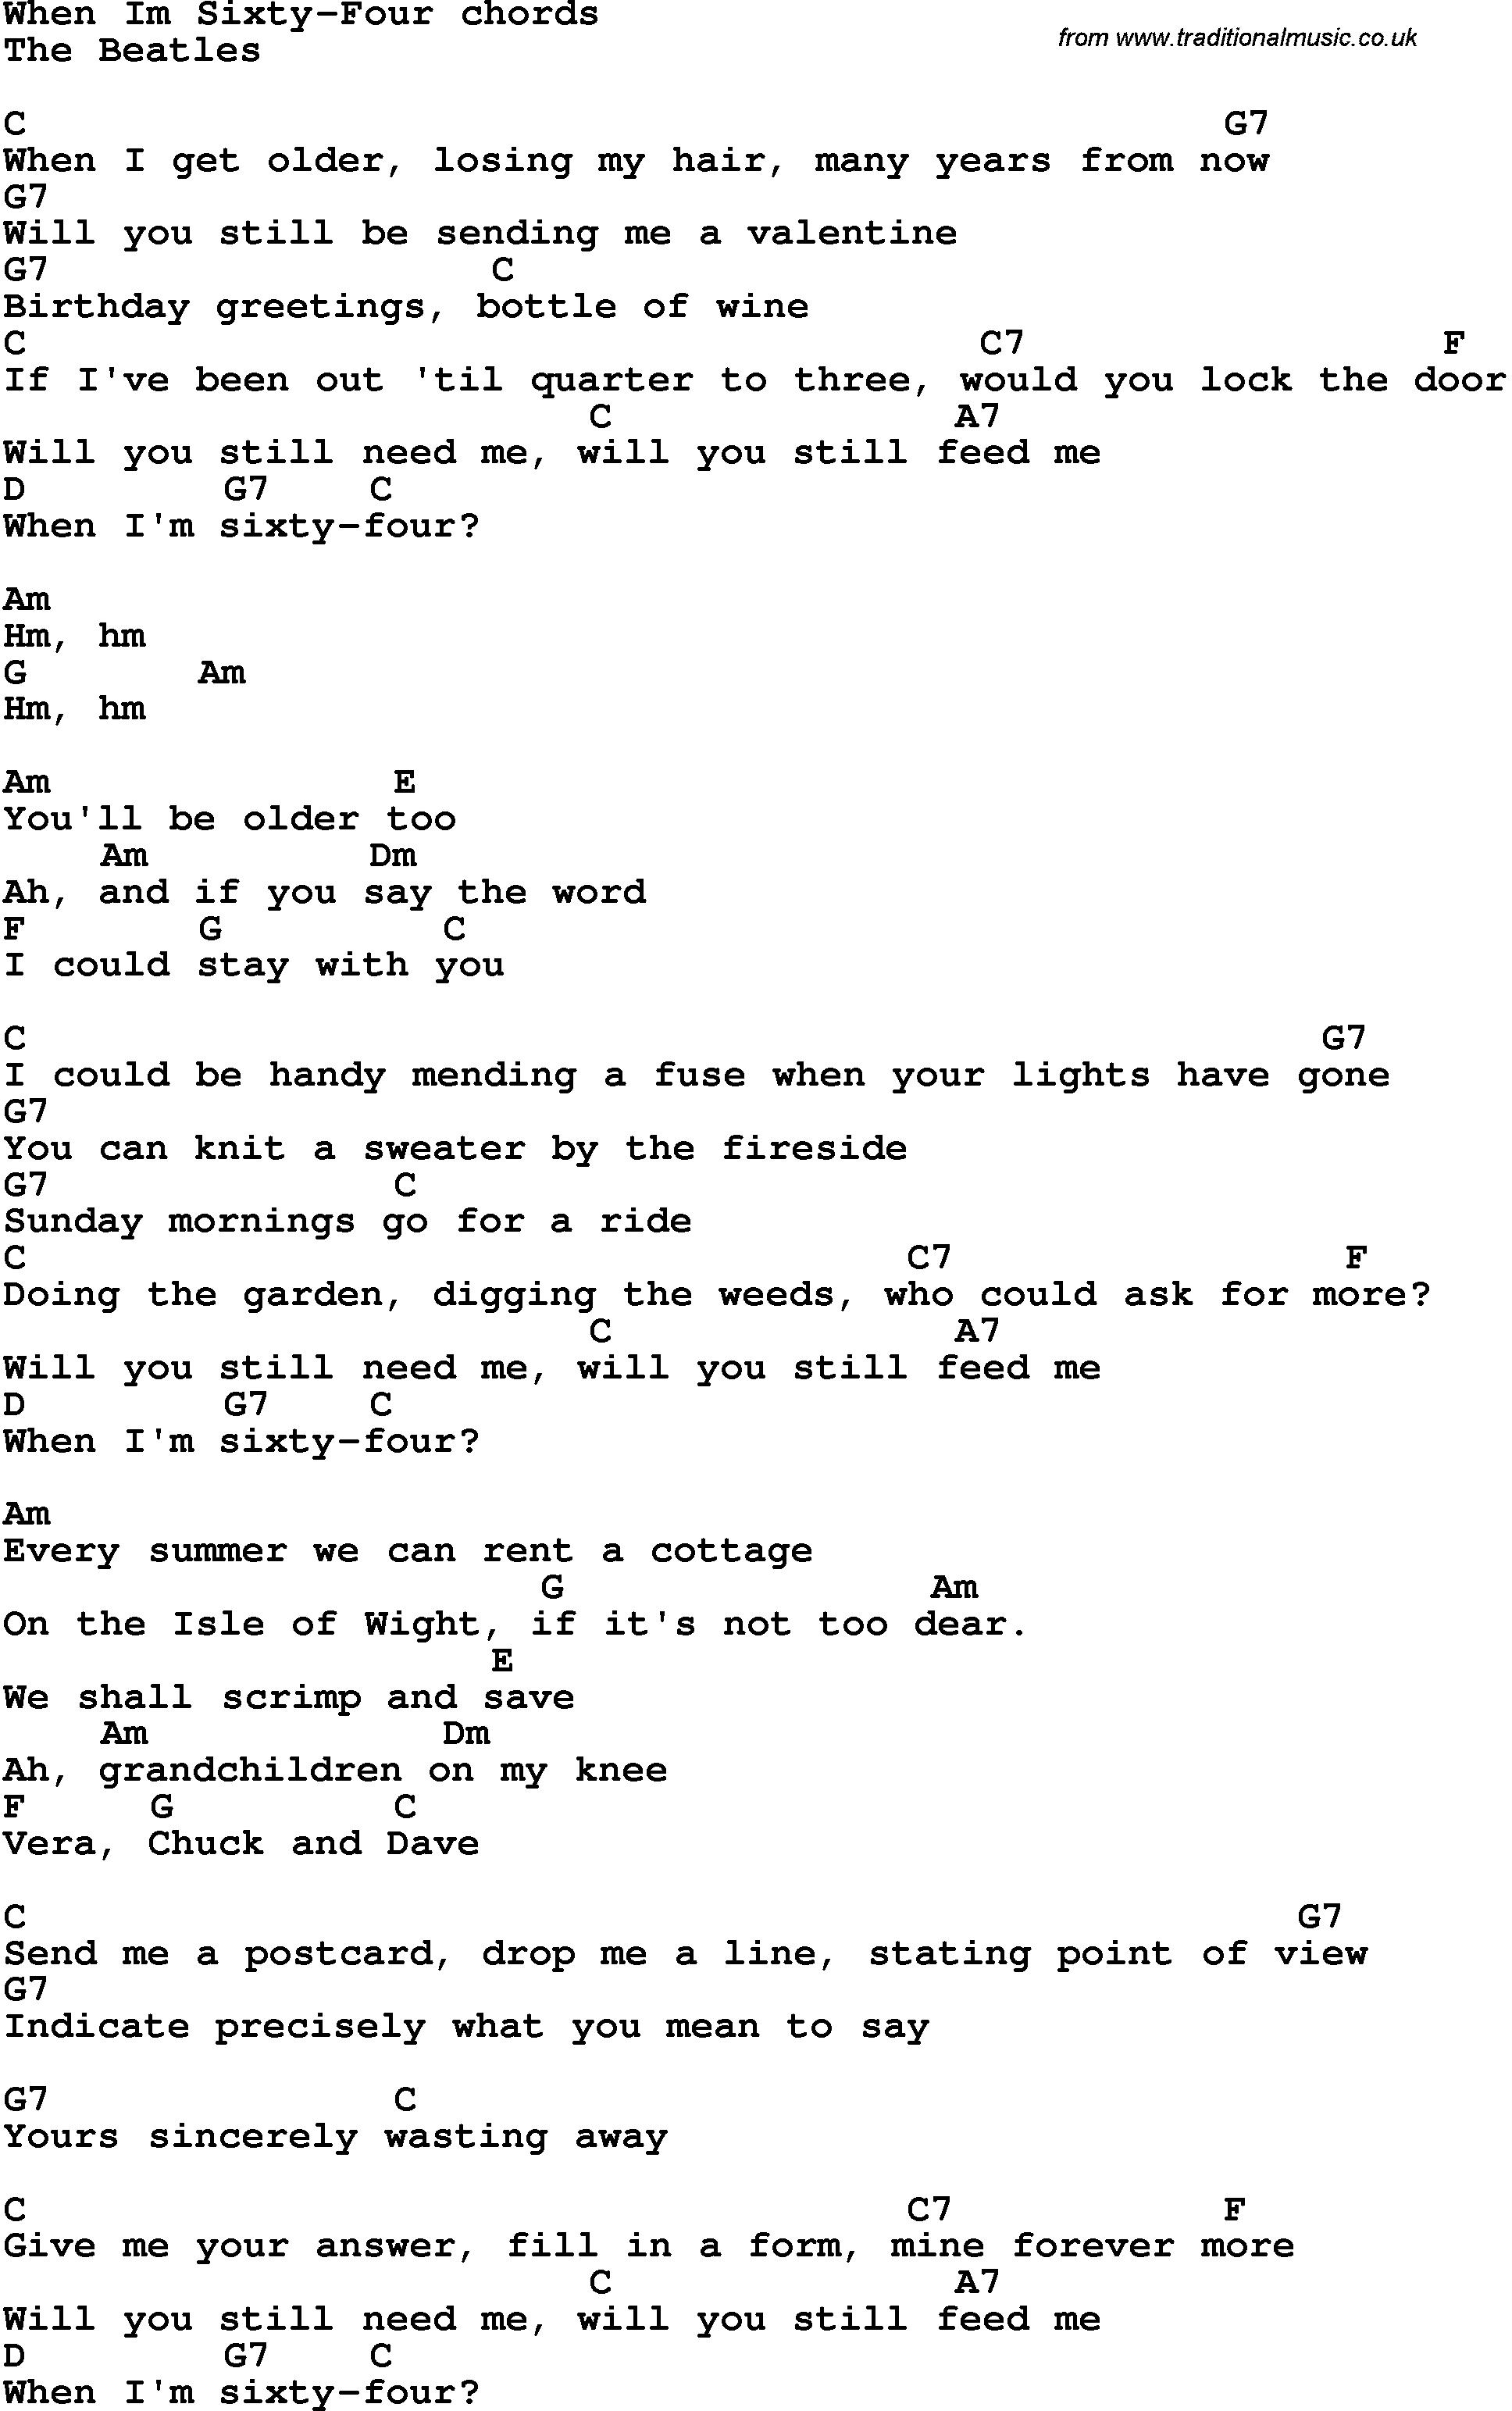 Music lyrics finder